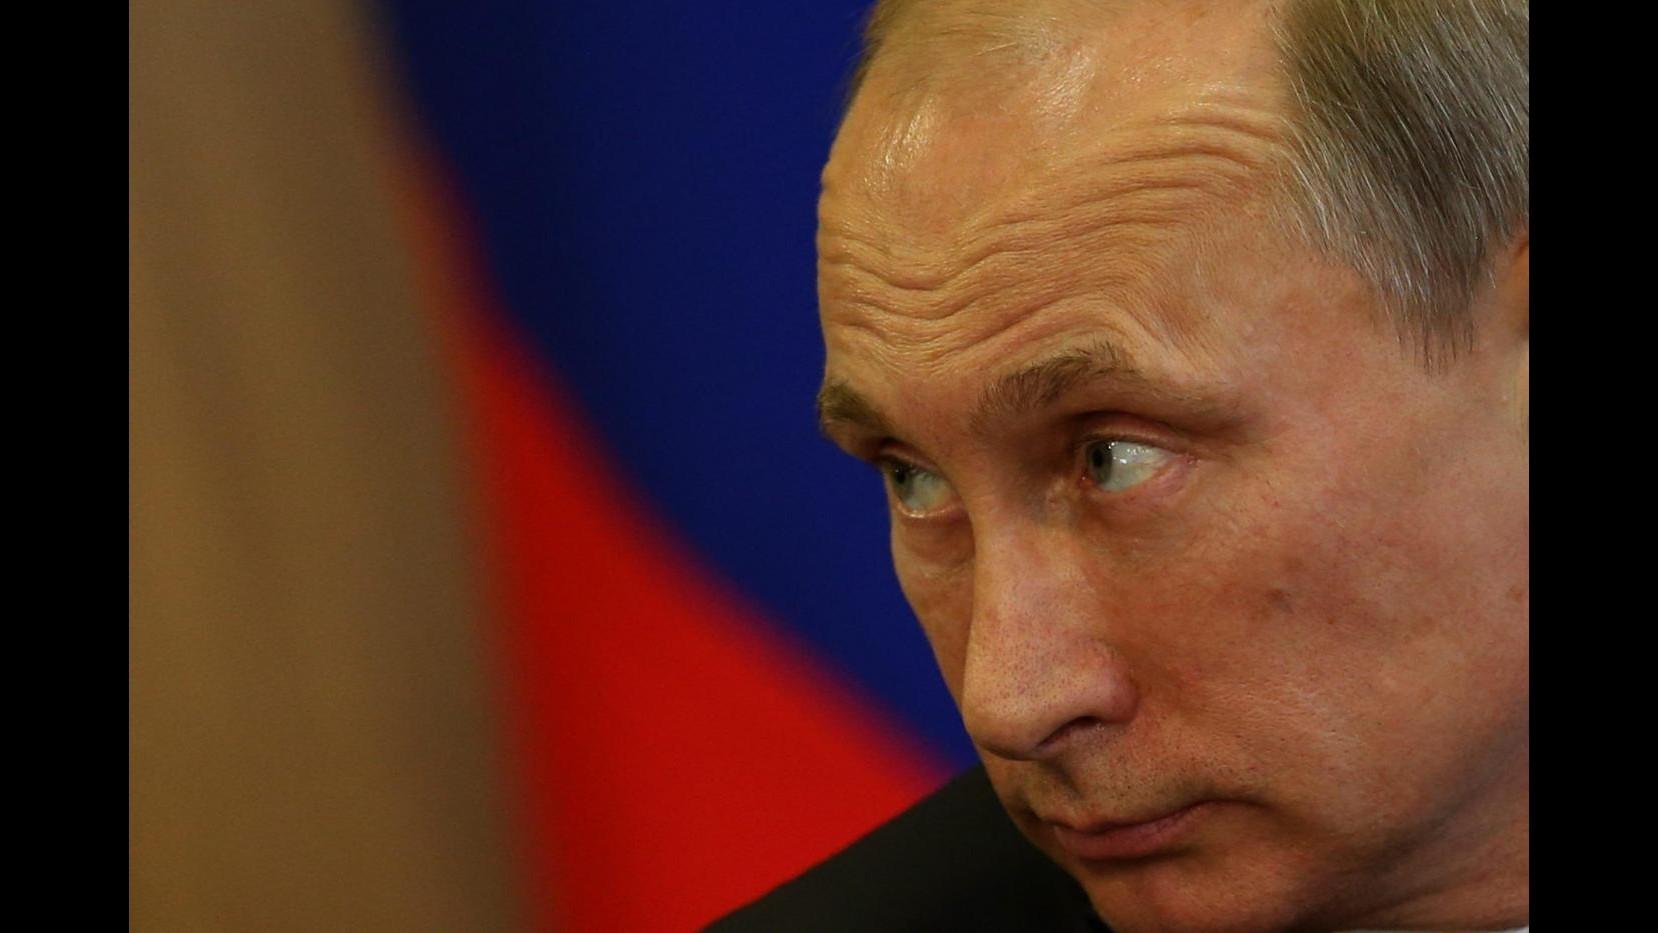 Russia ammette: Lista nera politici Ue è risposta a sanzioni